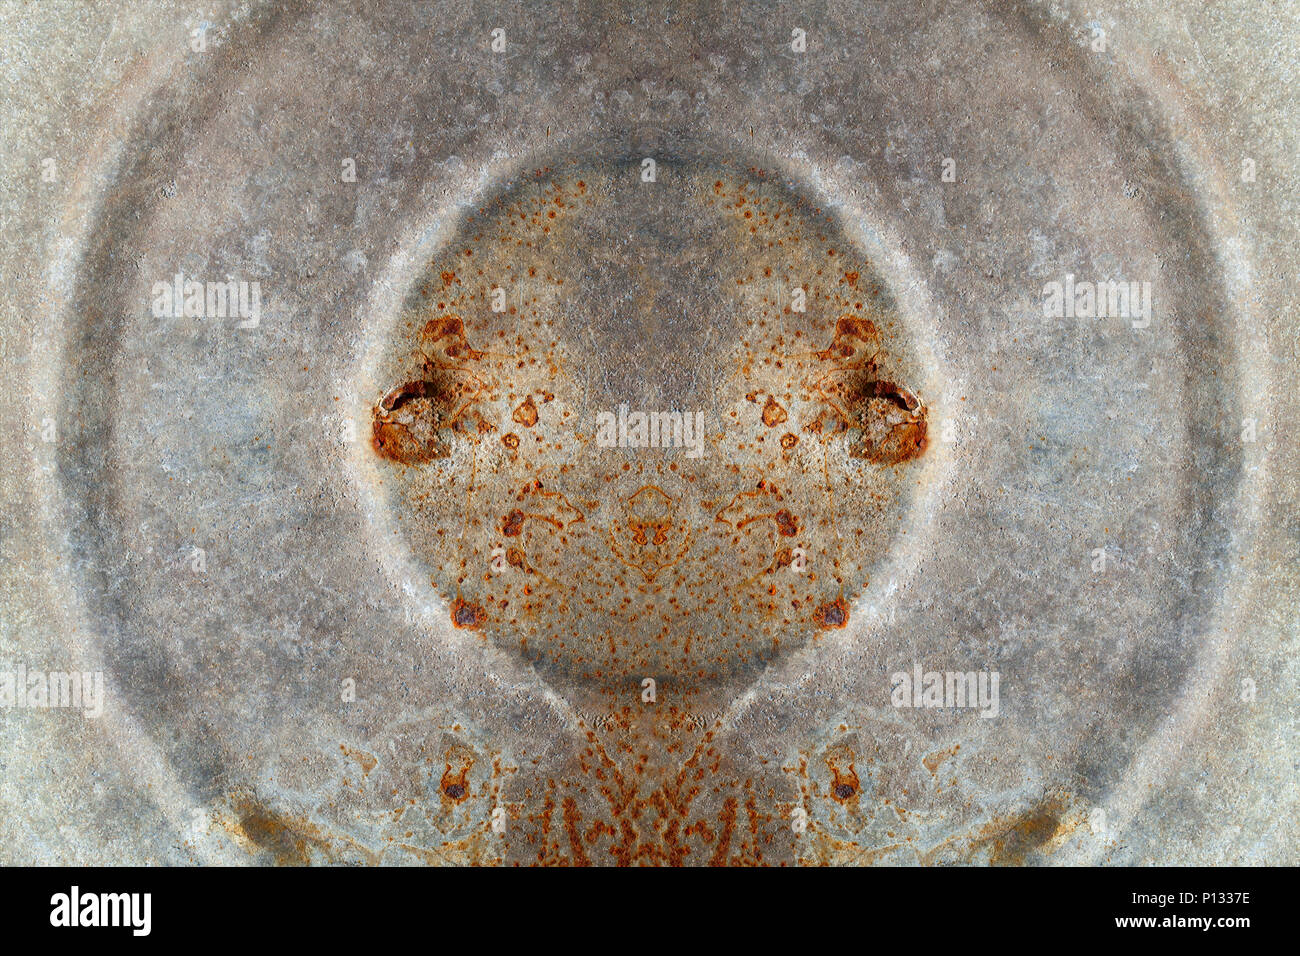 Rusty galvanized iron with circles. - Stock Image